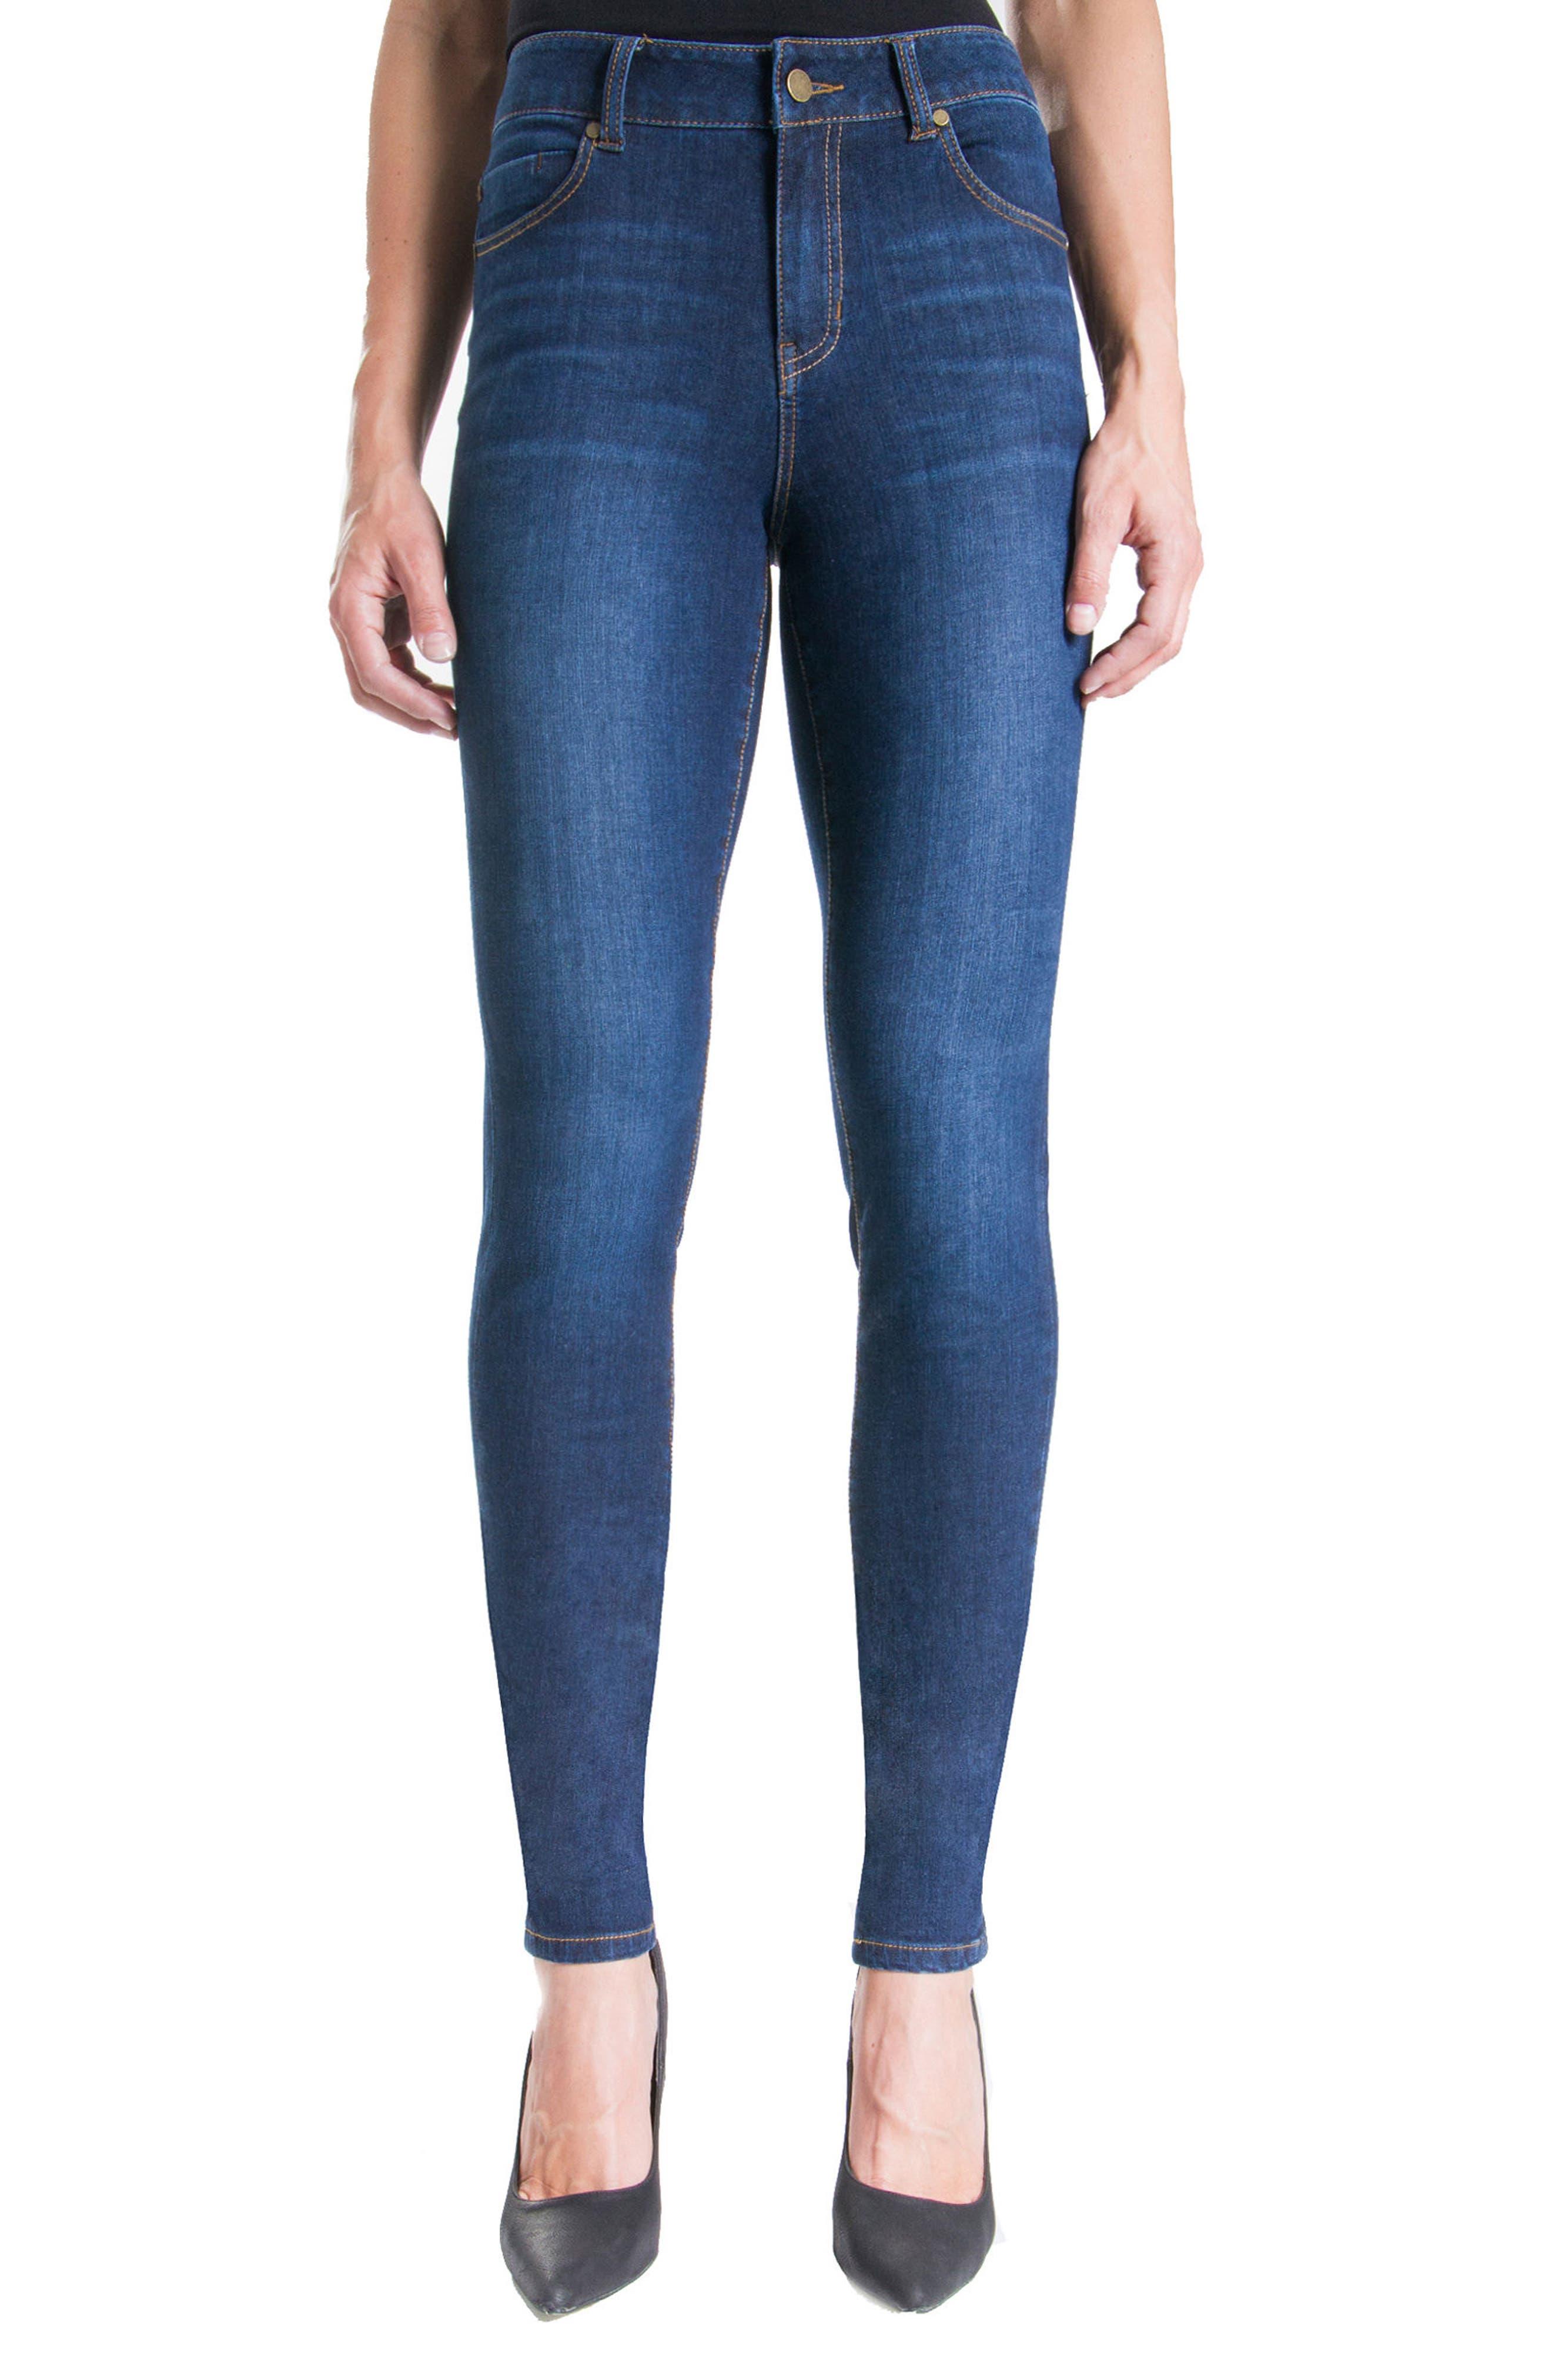 Liverpool Jeans Company Abby Stretch Skinny Jeans (Petite)